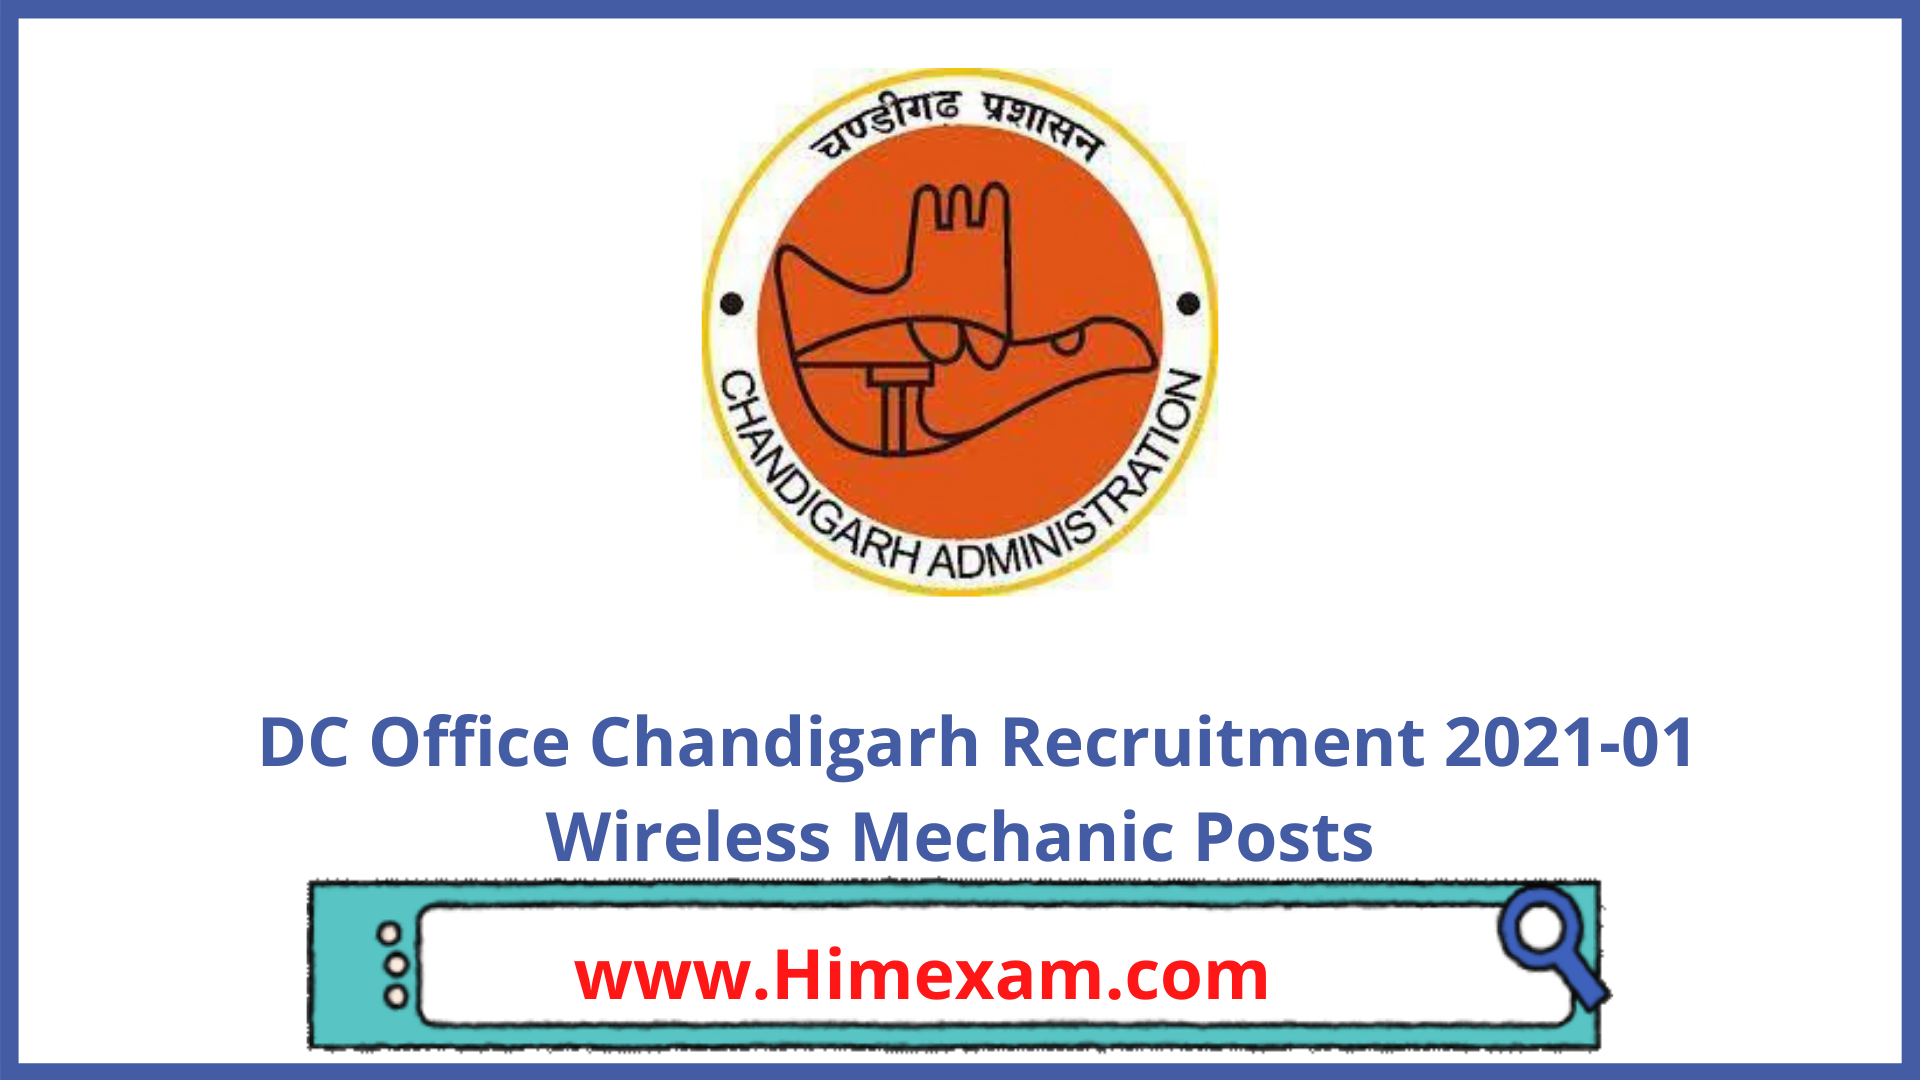 DC Office Chandigarh Recruitment 2021-01 Wireless Mechanic Posts